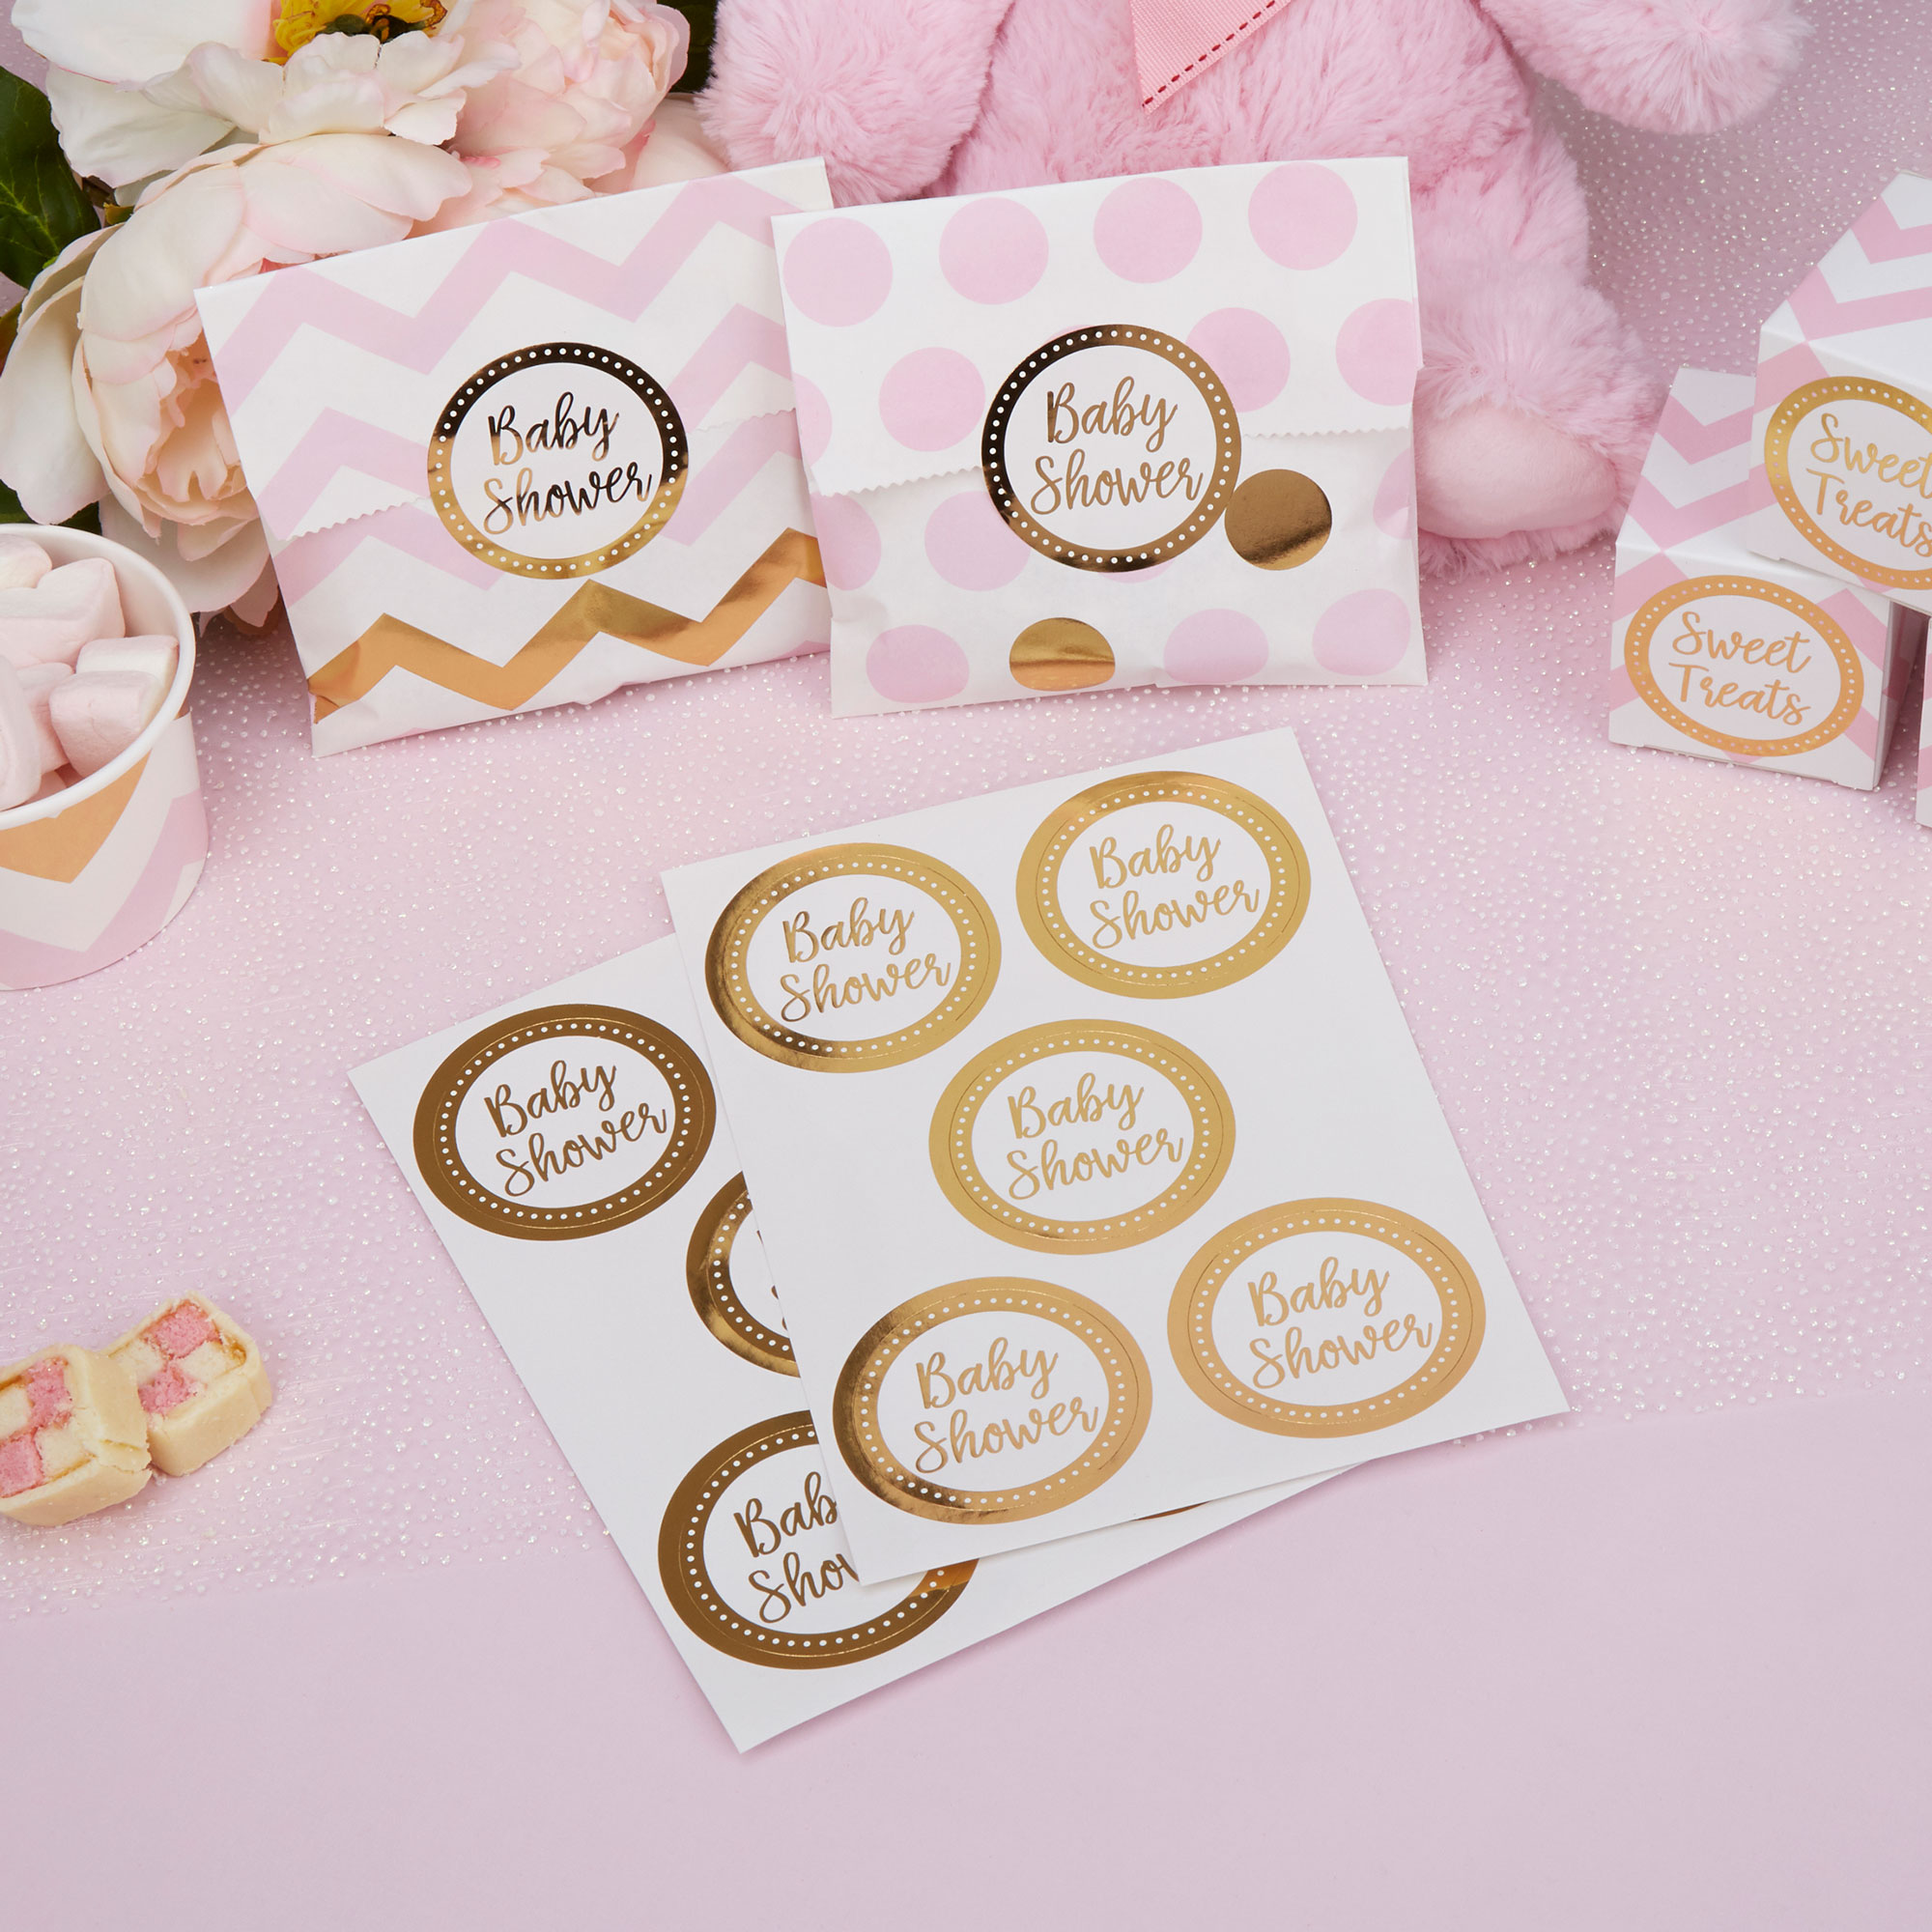 Baby Shower Cadeau Futur Maman autocollants stickers baby shower (x25)